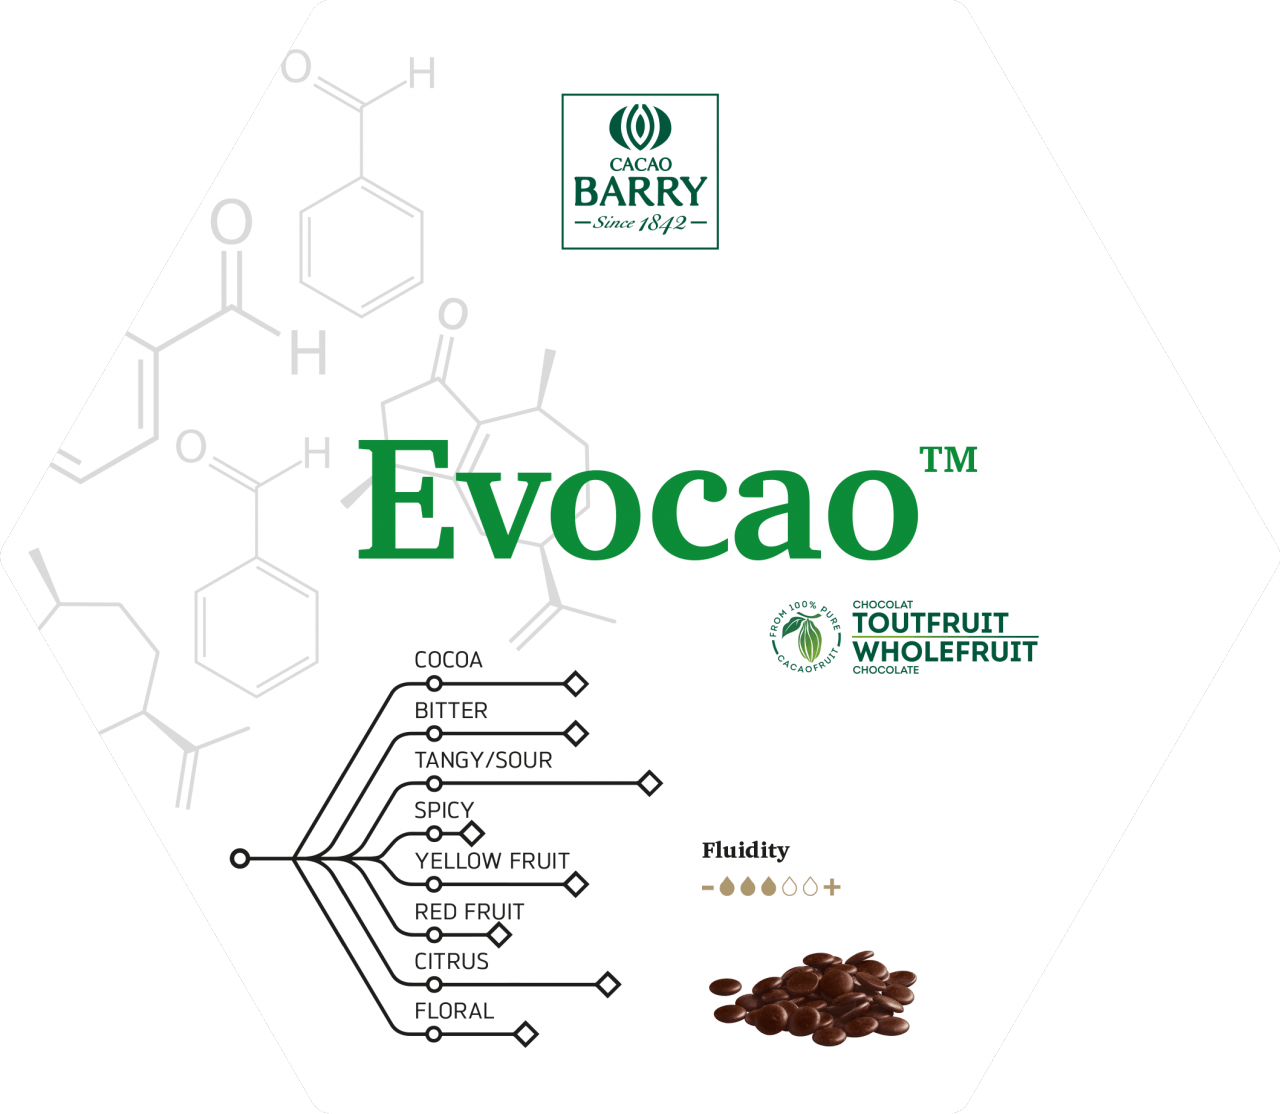 Evocao pairing card